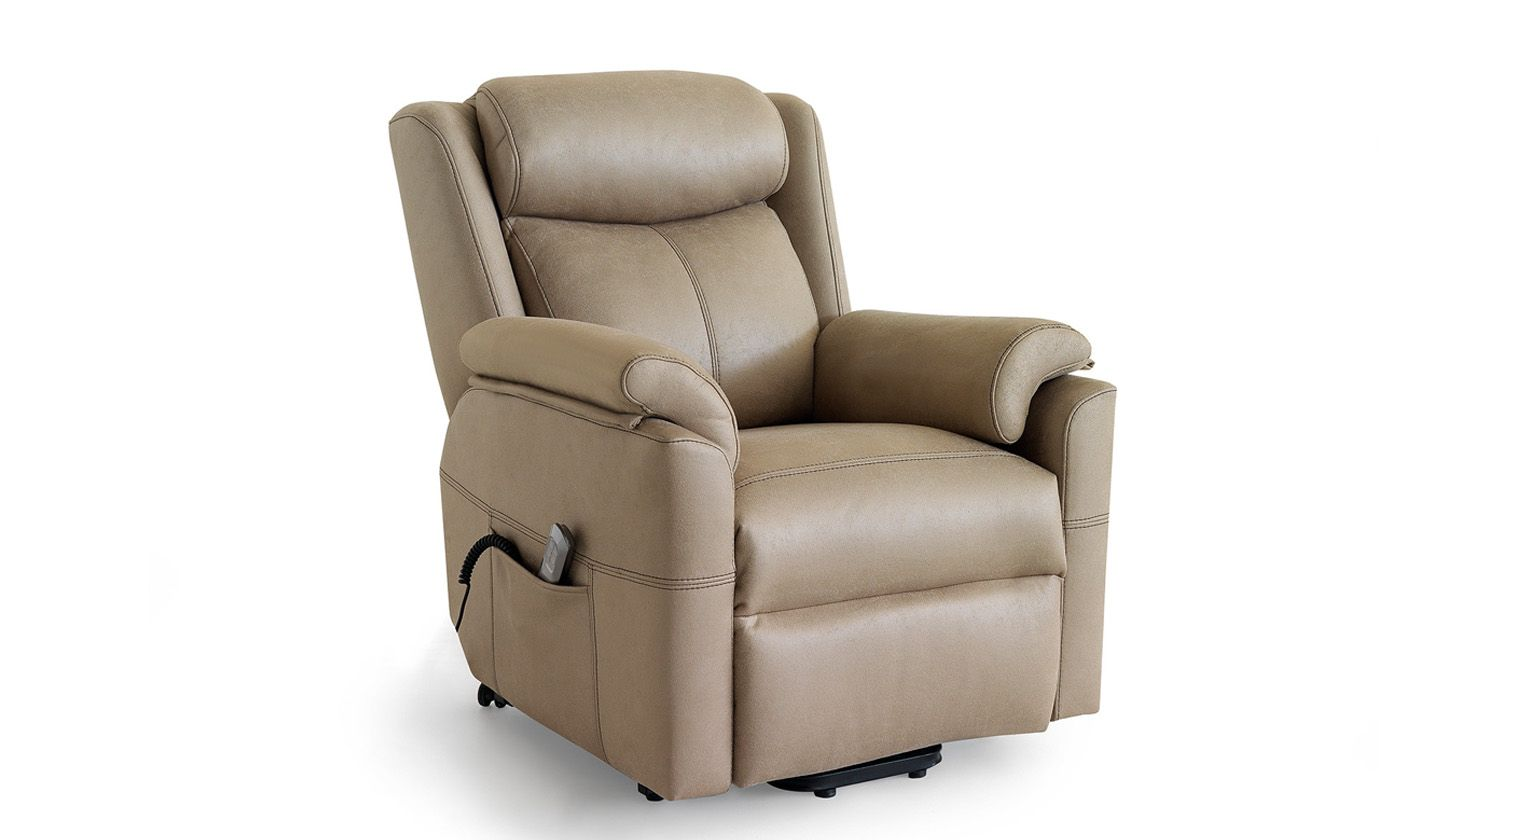 sofas chaise longue baratos madrid luxury sofa sale comprar sillón relax belona elevador 1 motor ...